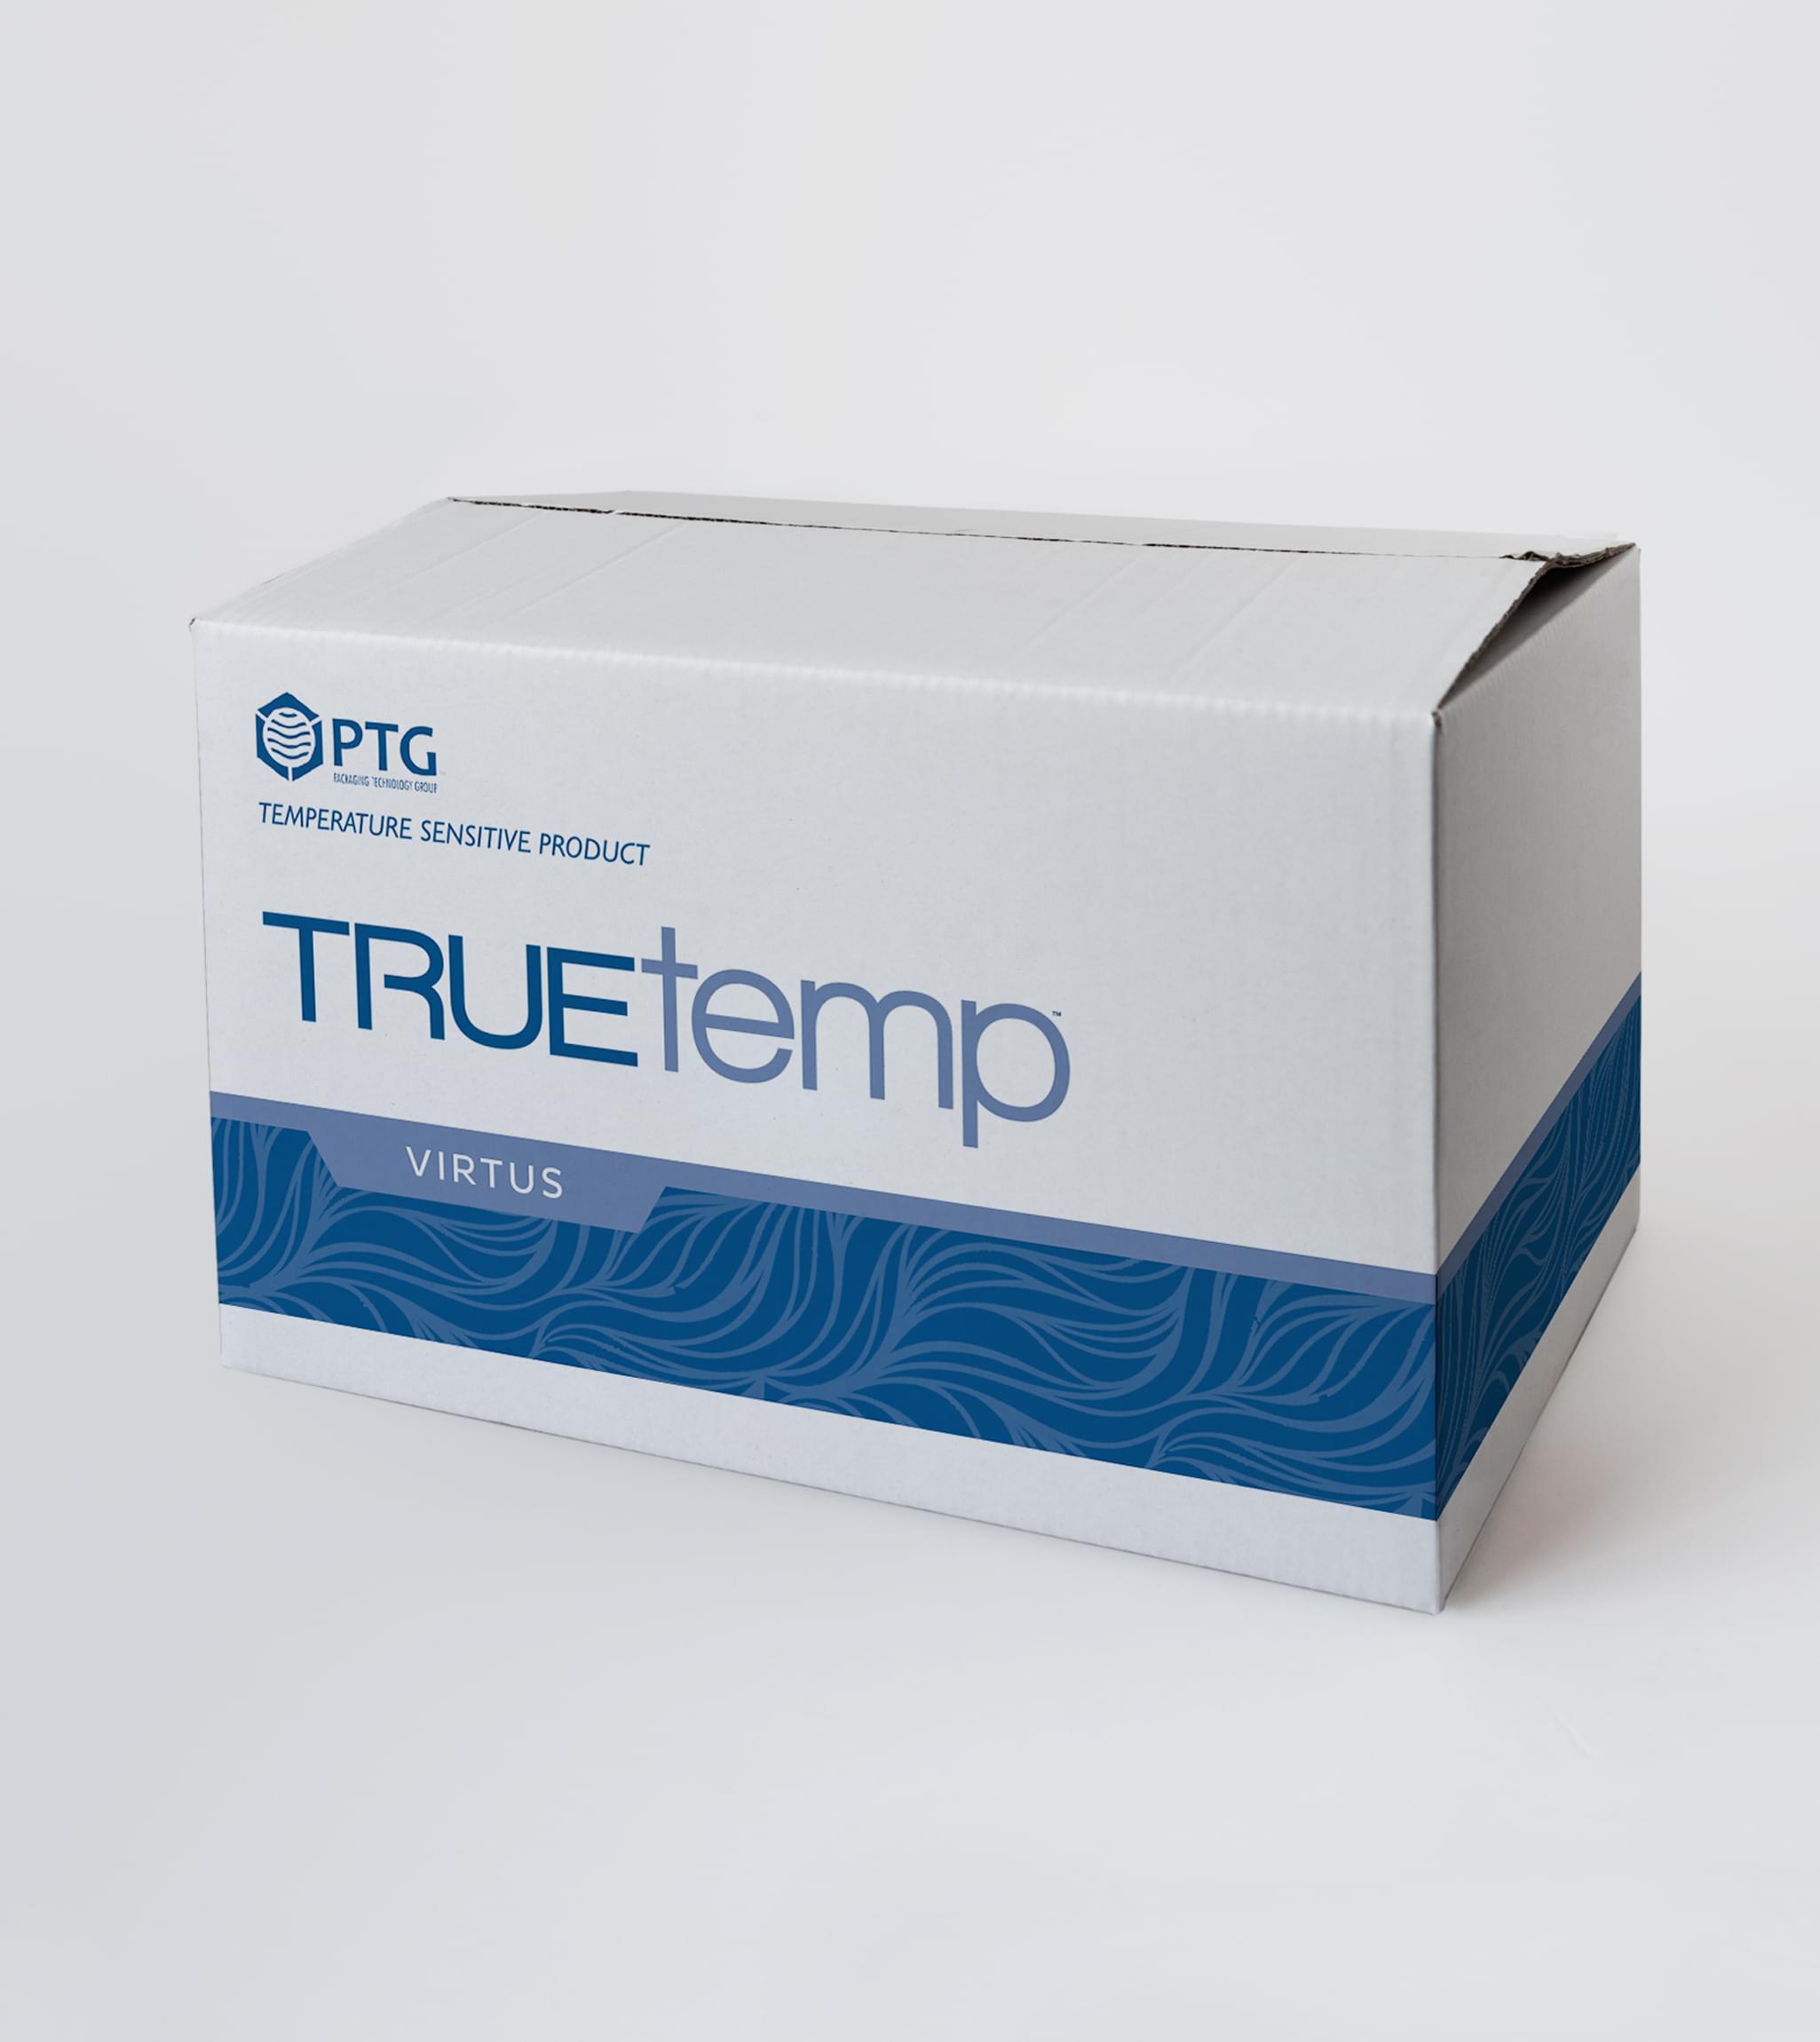 PTG Packaging